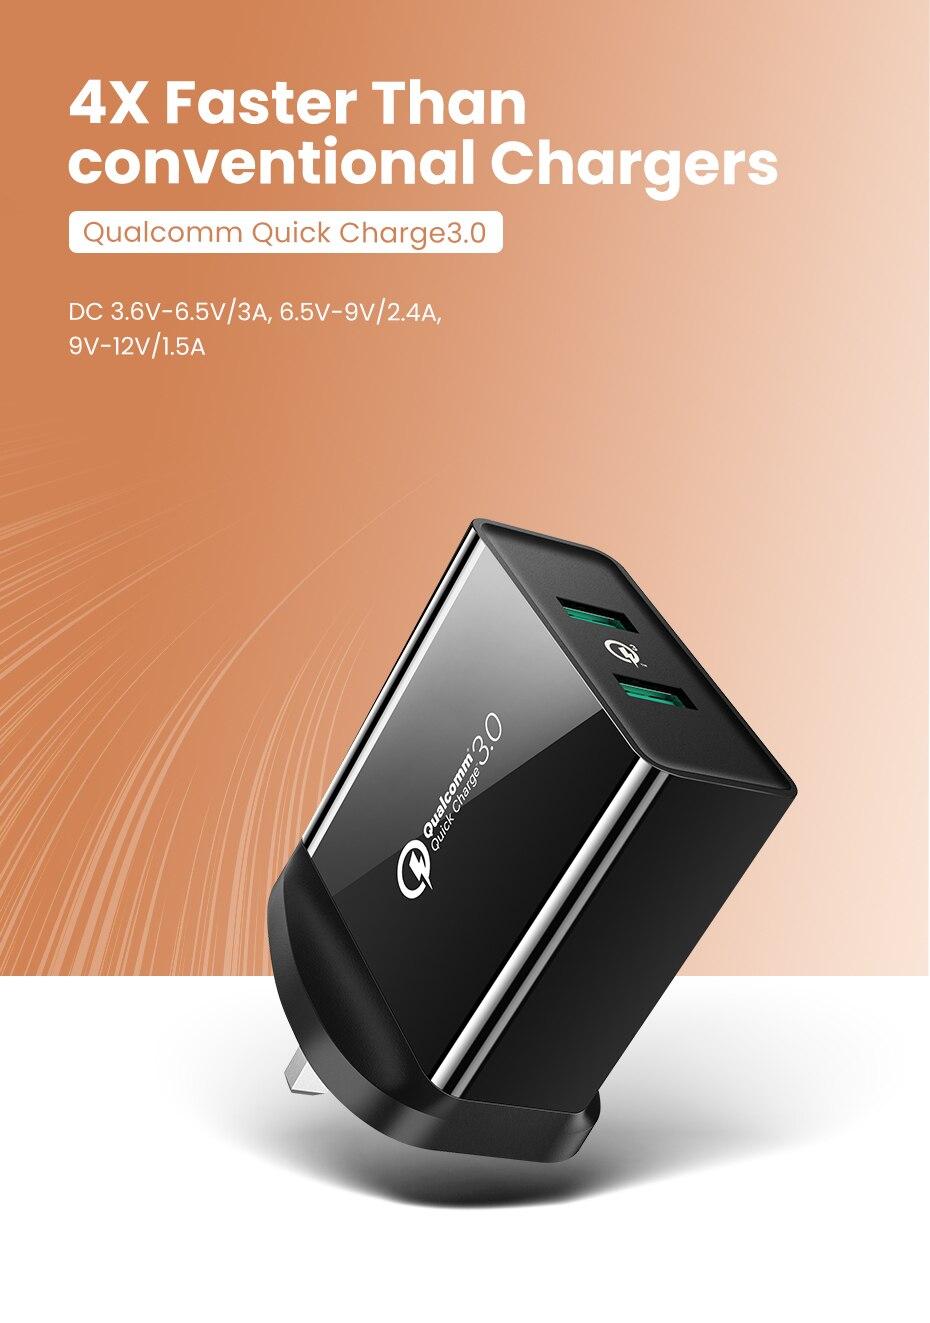 CD161-930-_02